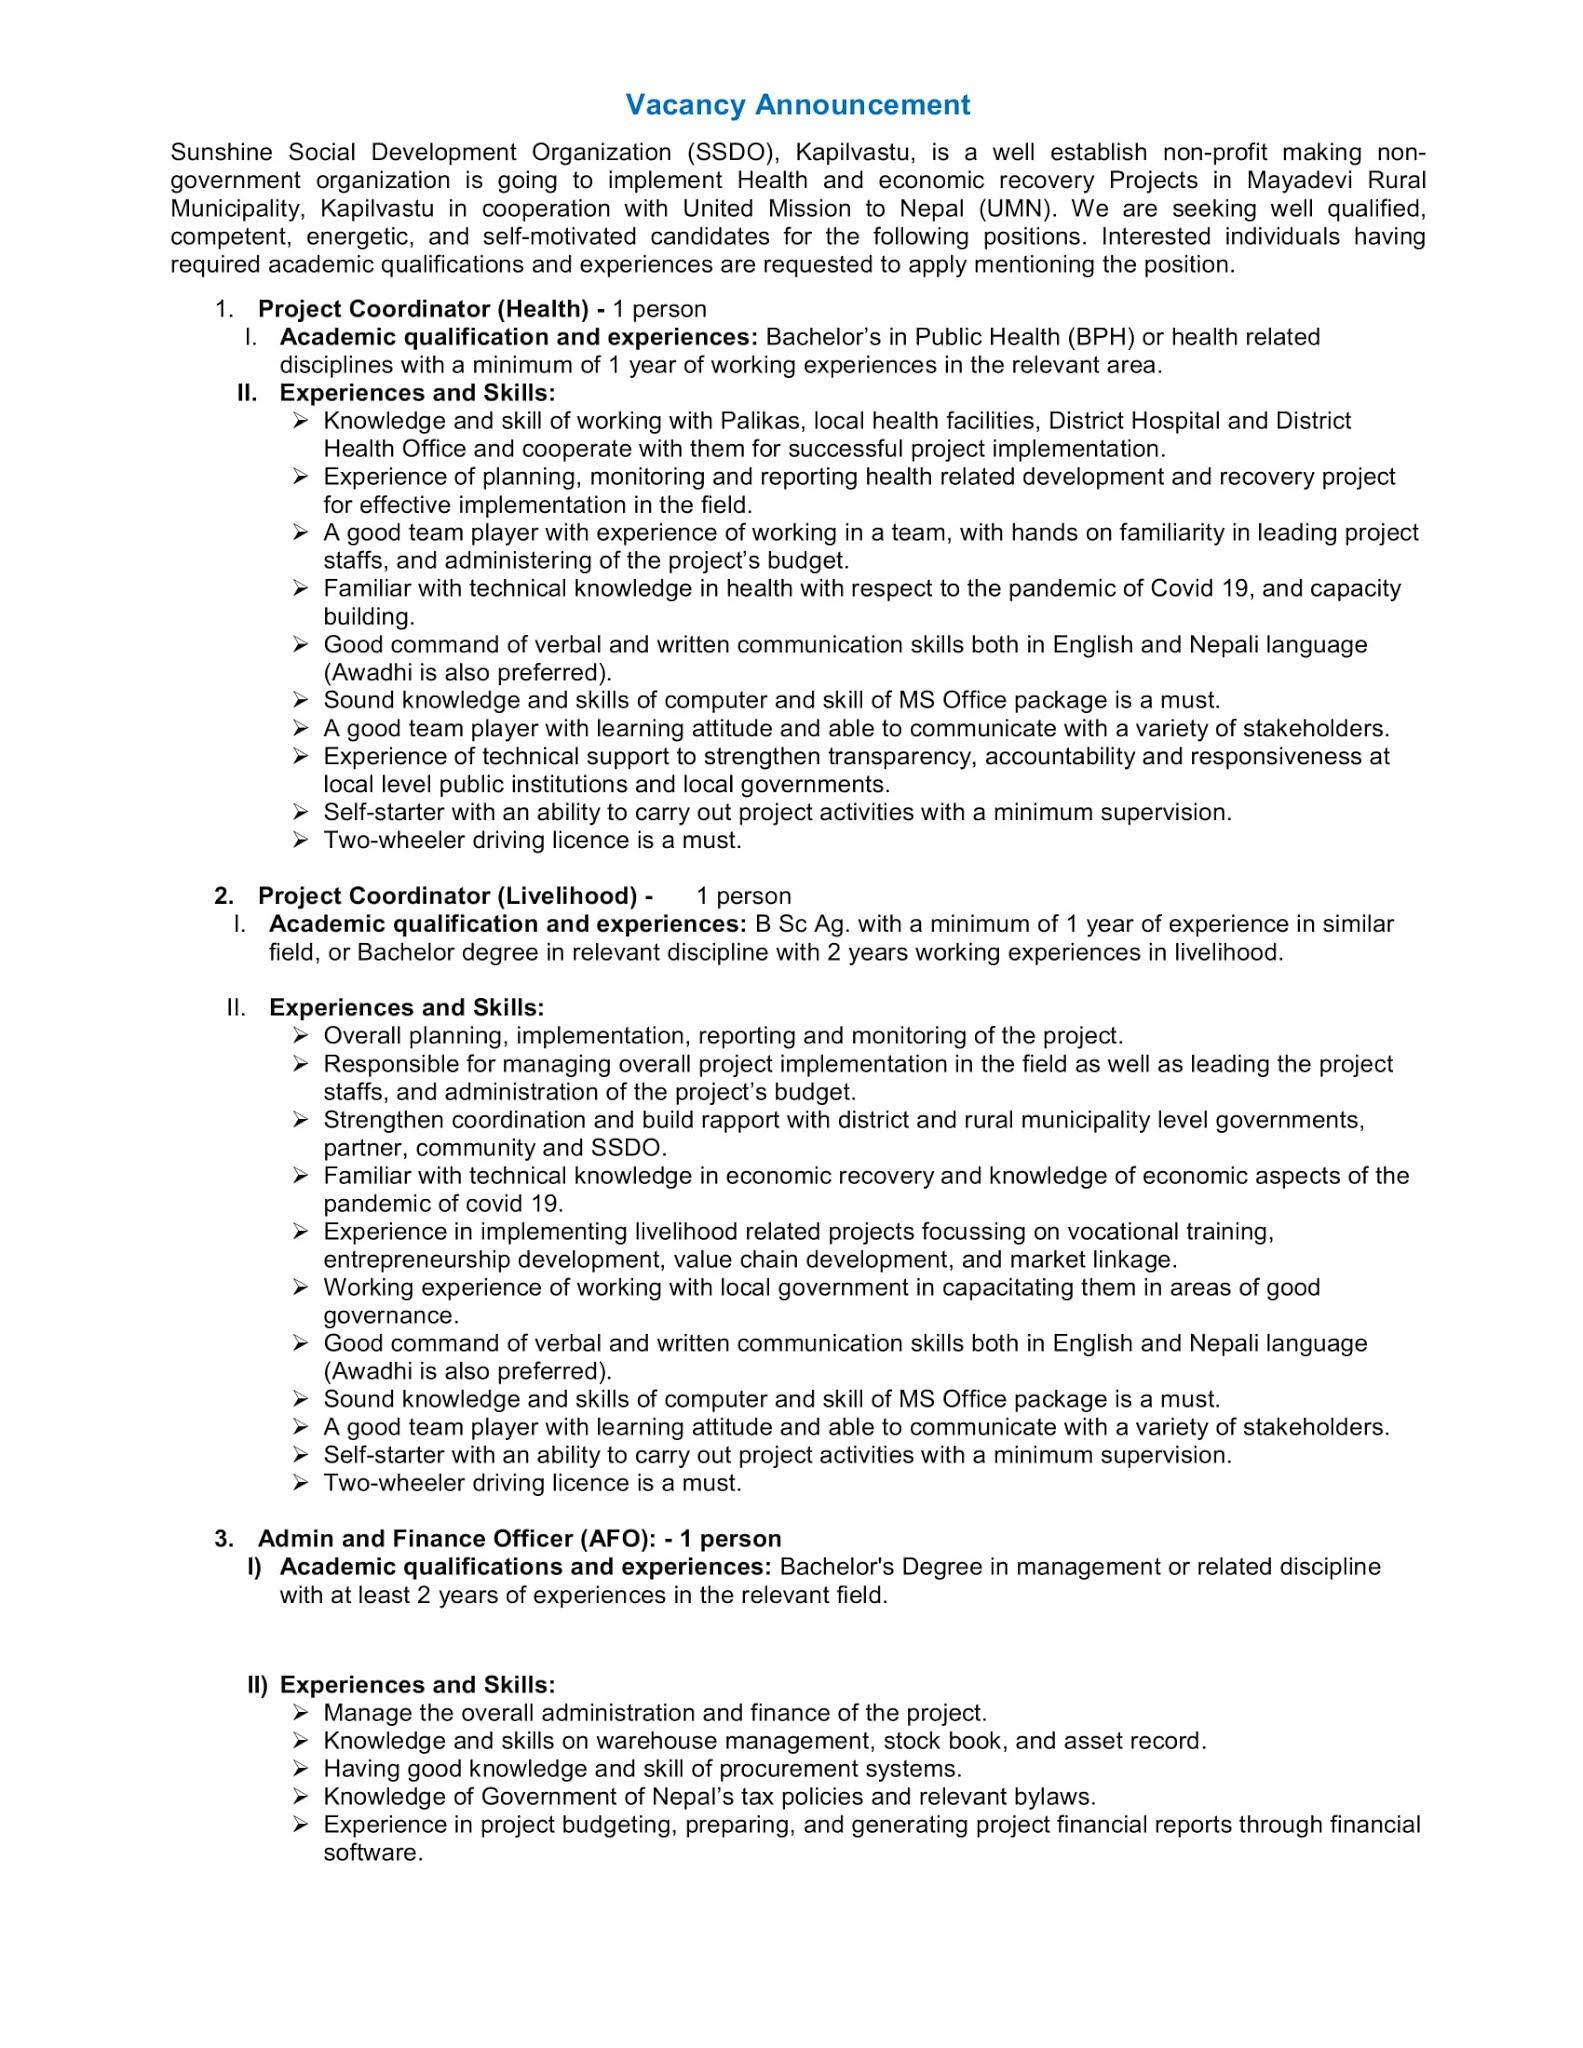 Sunshine Social Development Organization Vacancy for Various Positions